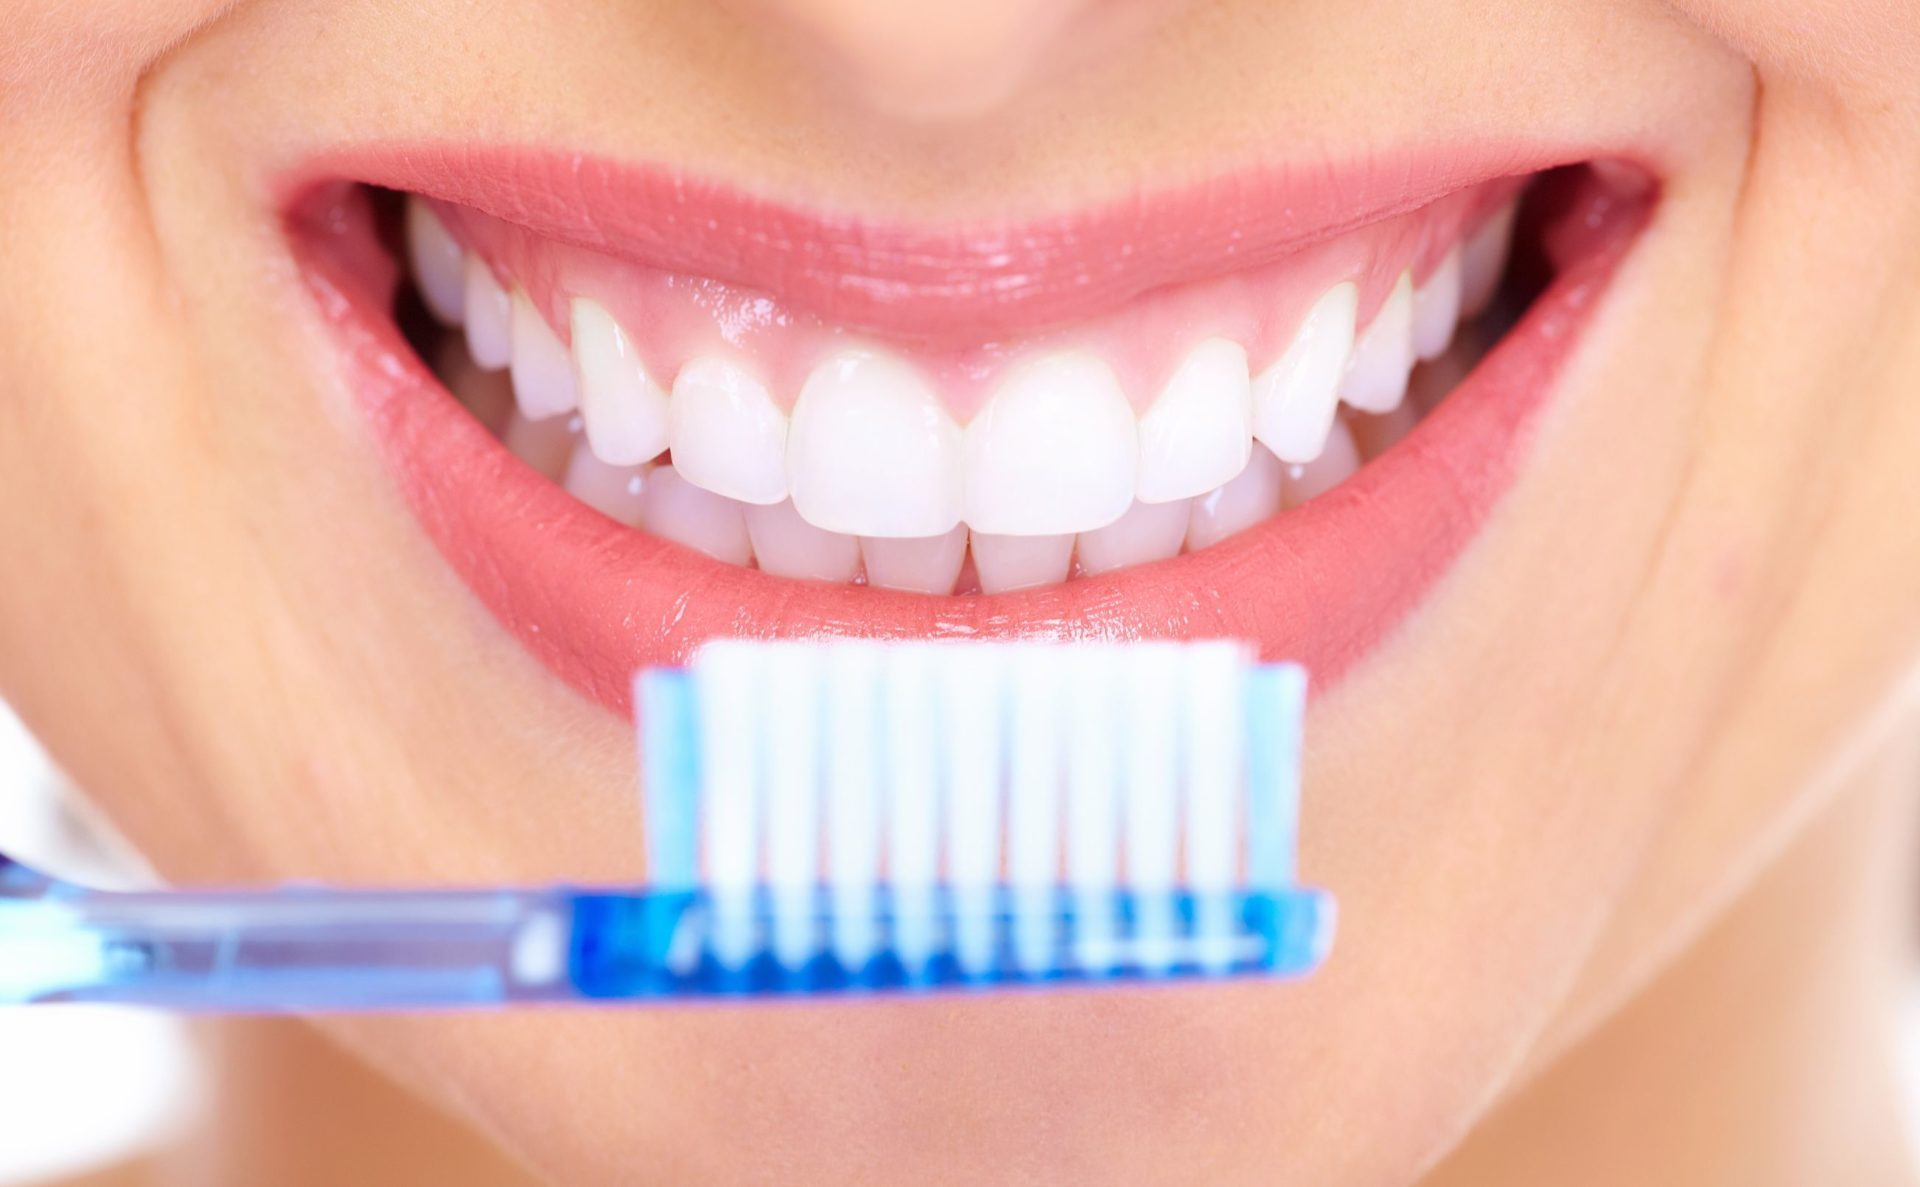 cómo prevenir la caries dental, prevenir la caries dental, cepillo dental, higiene oral, dentista, clínica dental